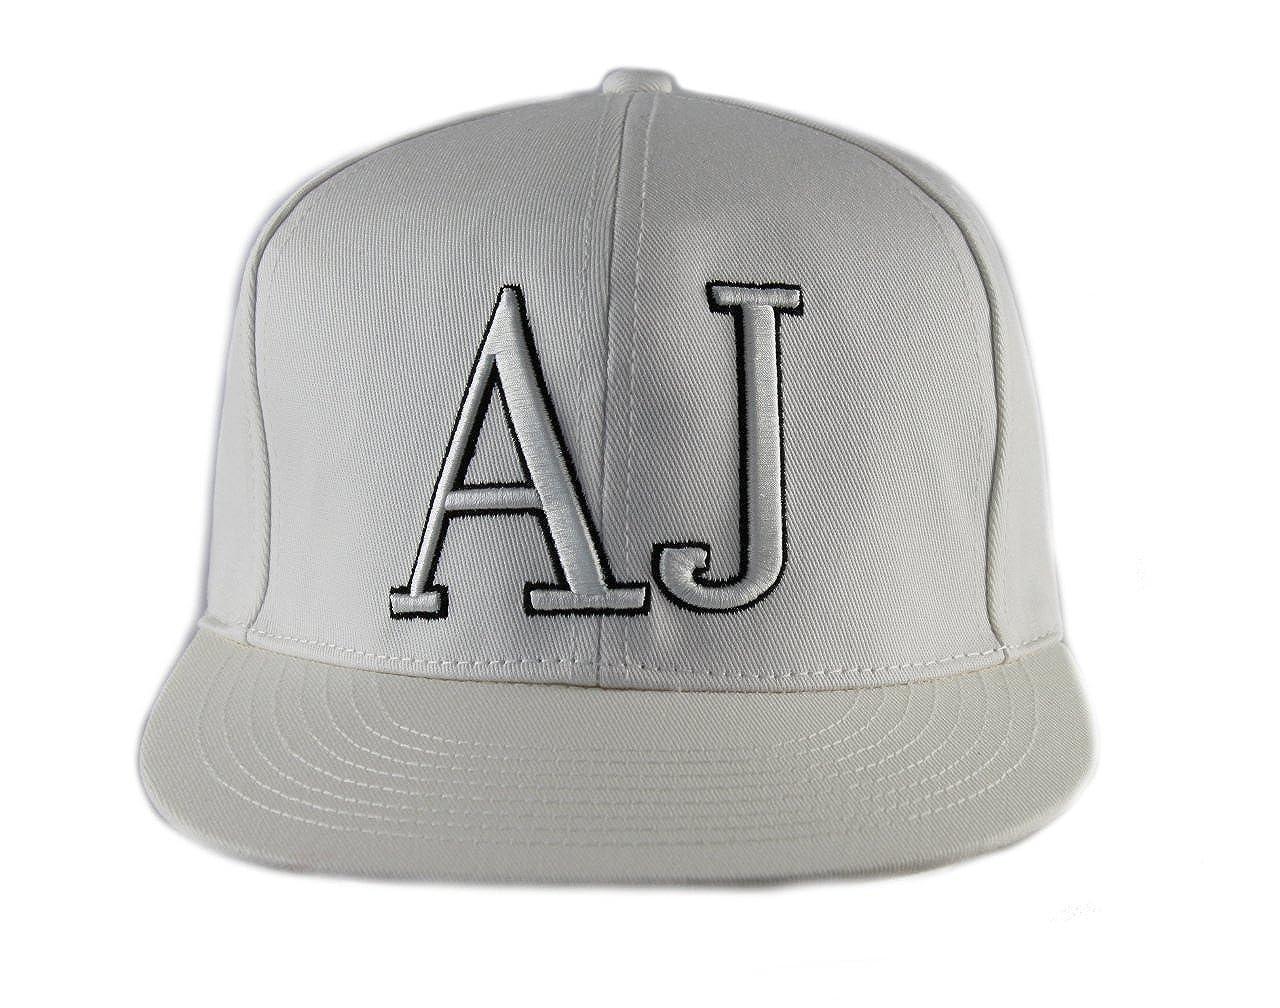 Armani Jeans - Gorra de béisbol - para hombre blanco Weiß: Amazon ...